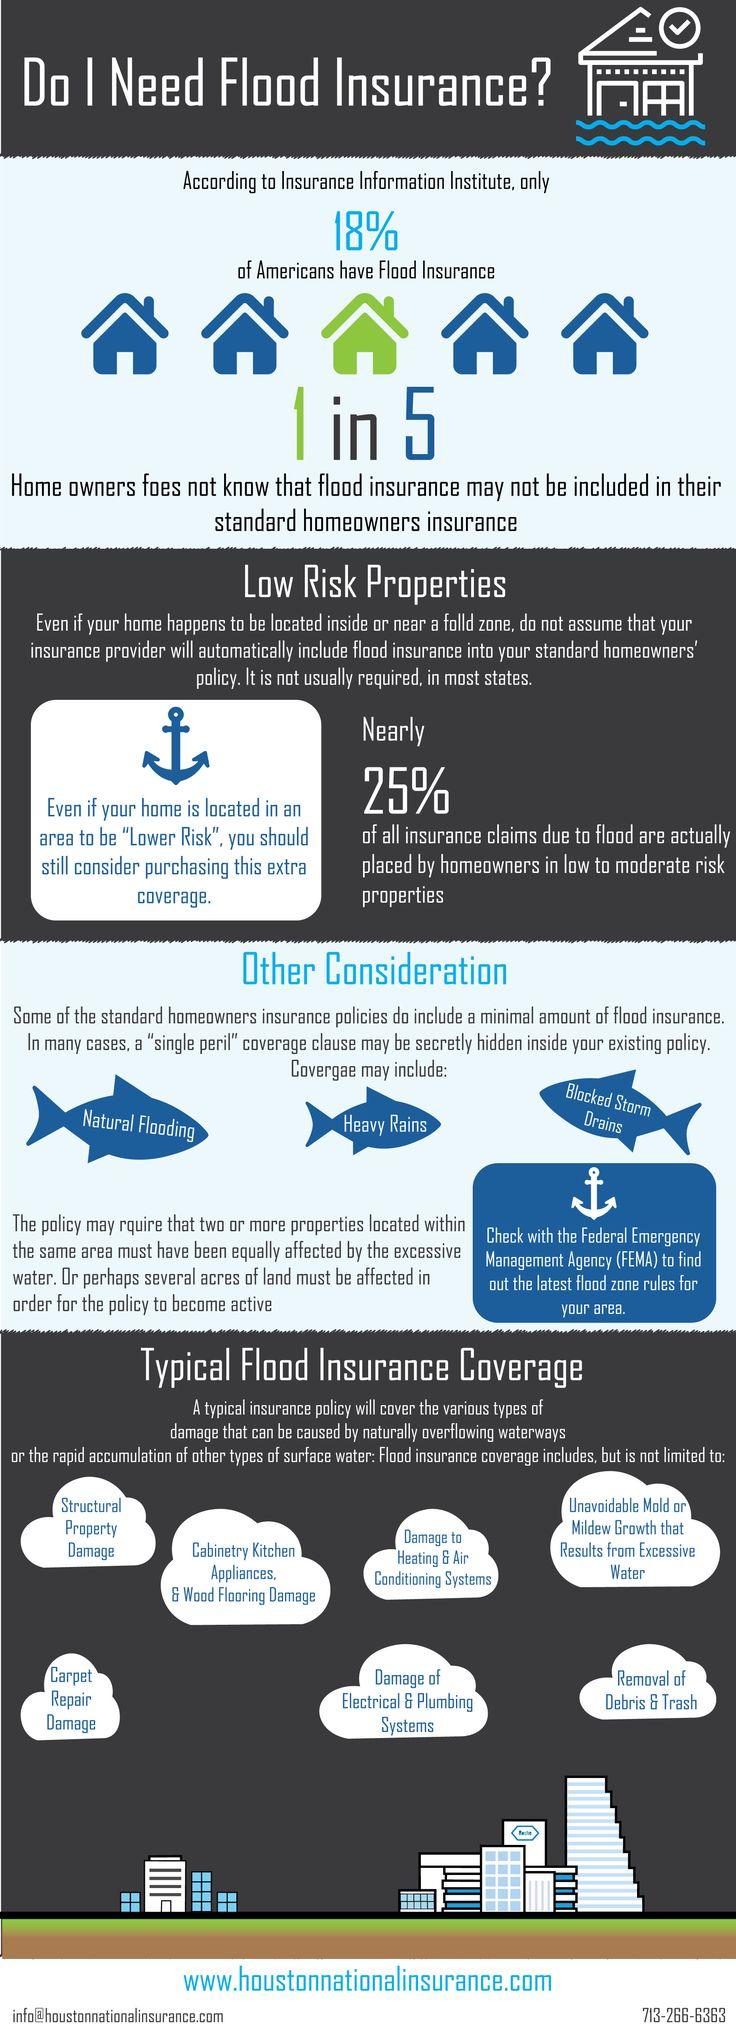 Find importance of best flood #insurance in #Houston. Request a quote for flood insurance in Houston.